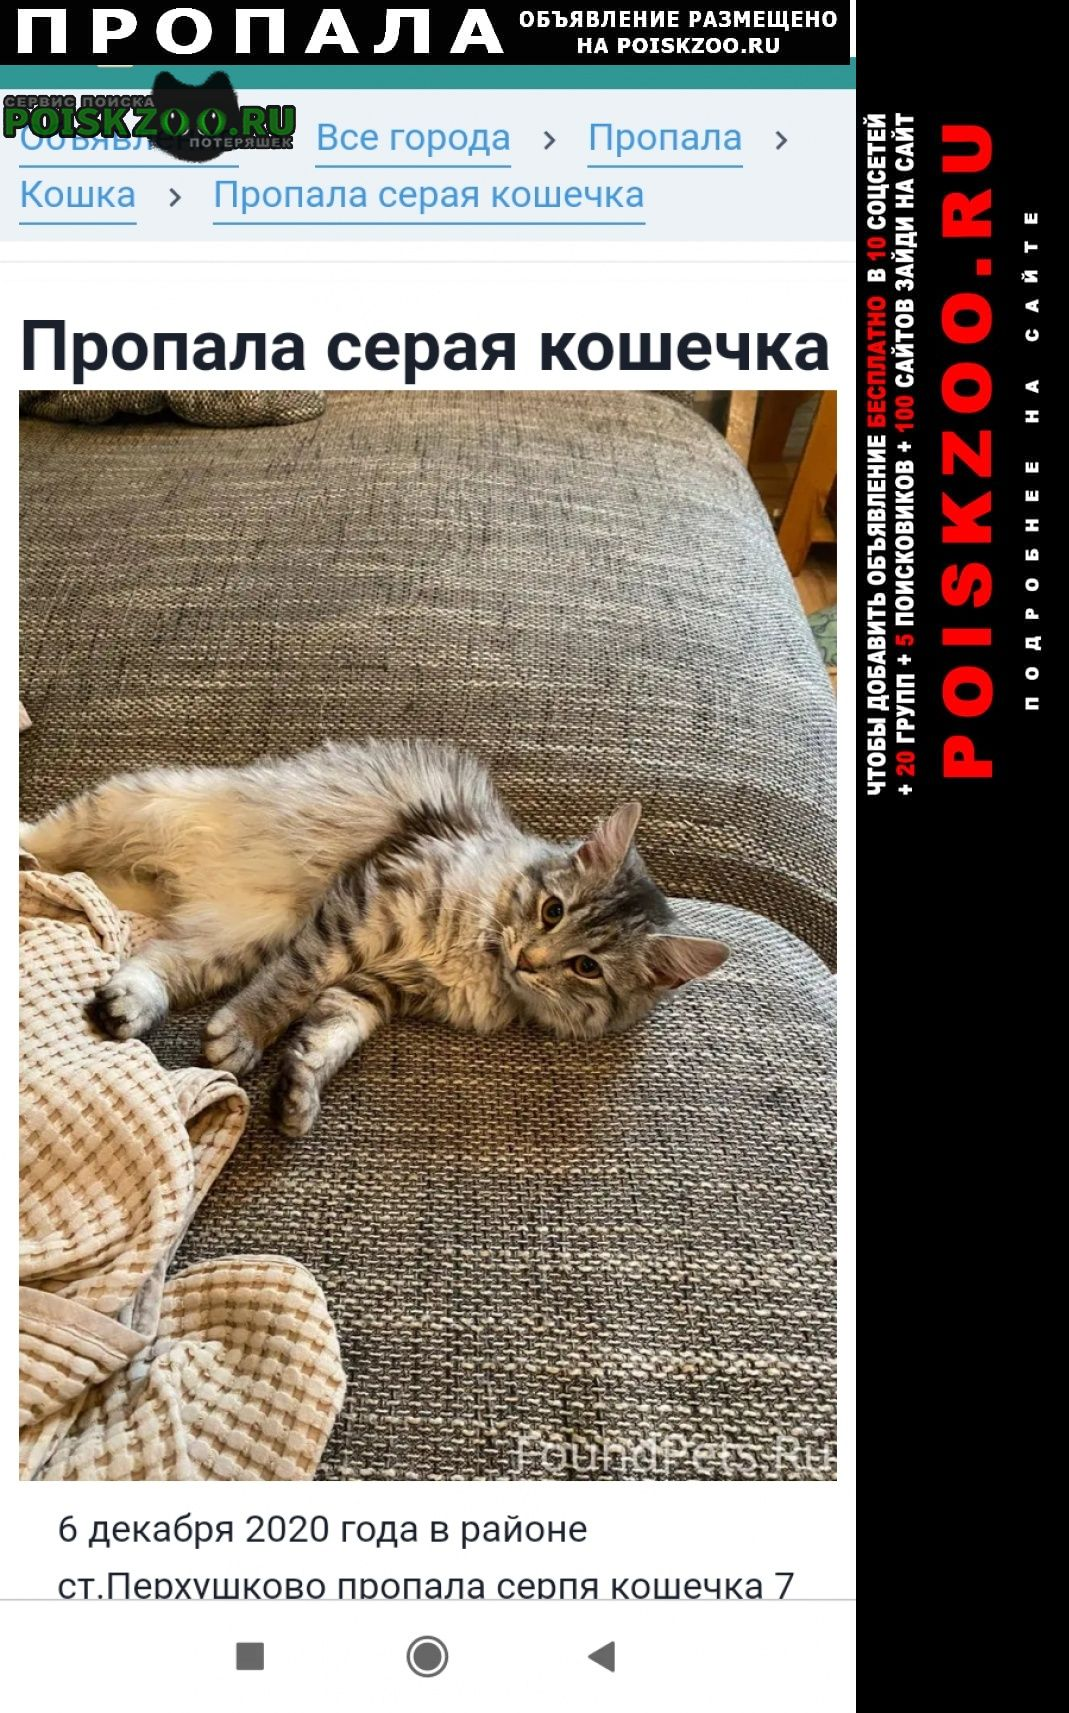 Пропала кошка 6 декабря Одинцово